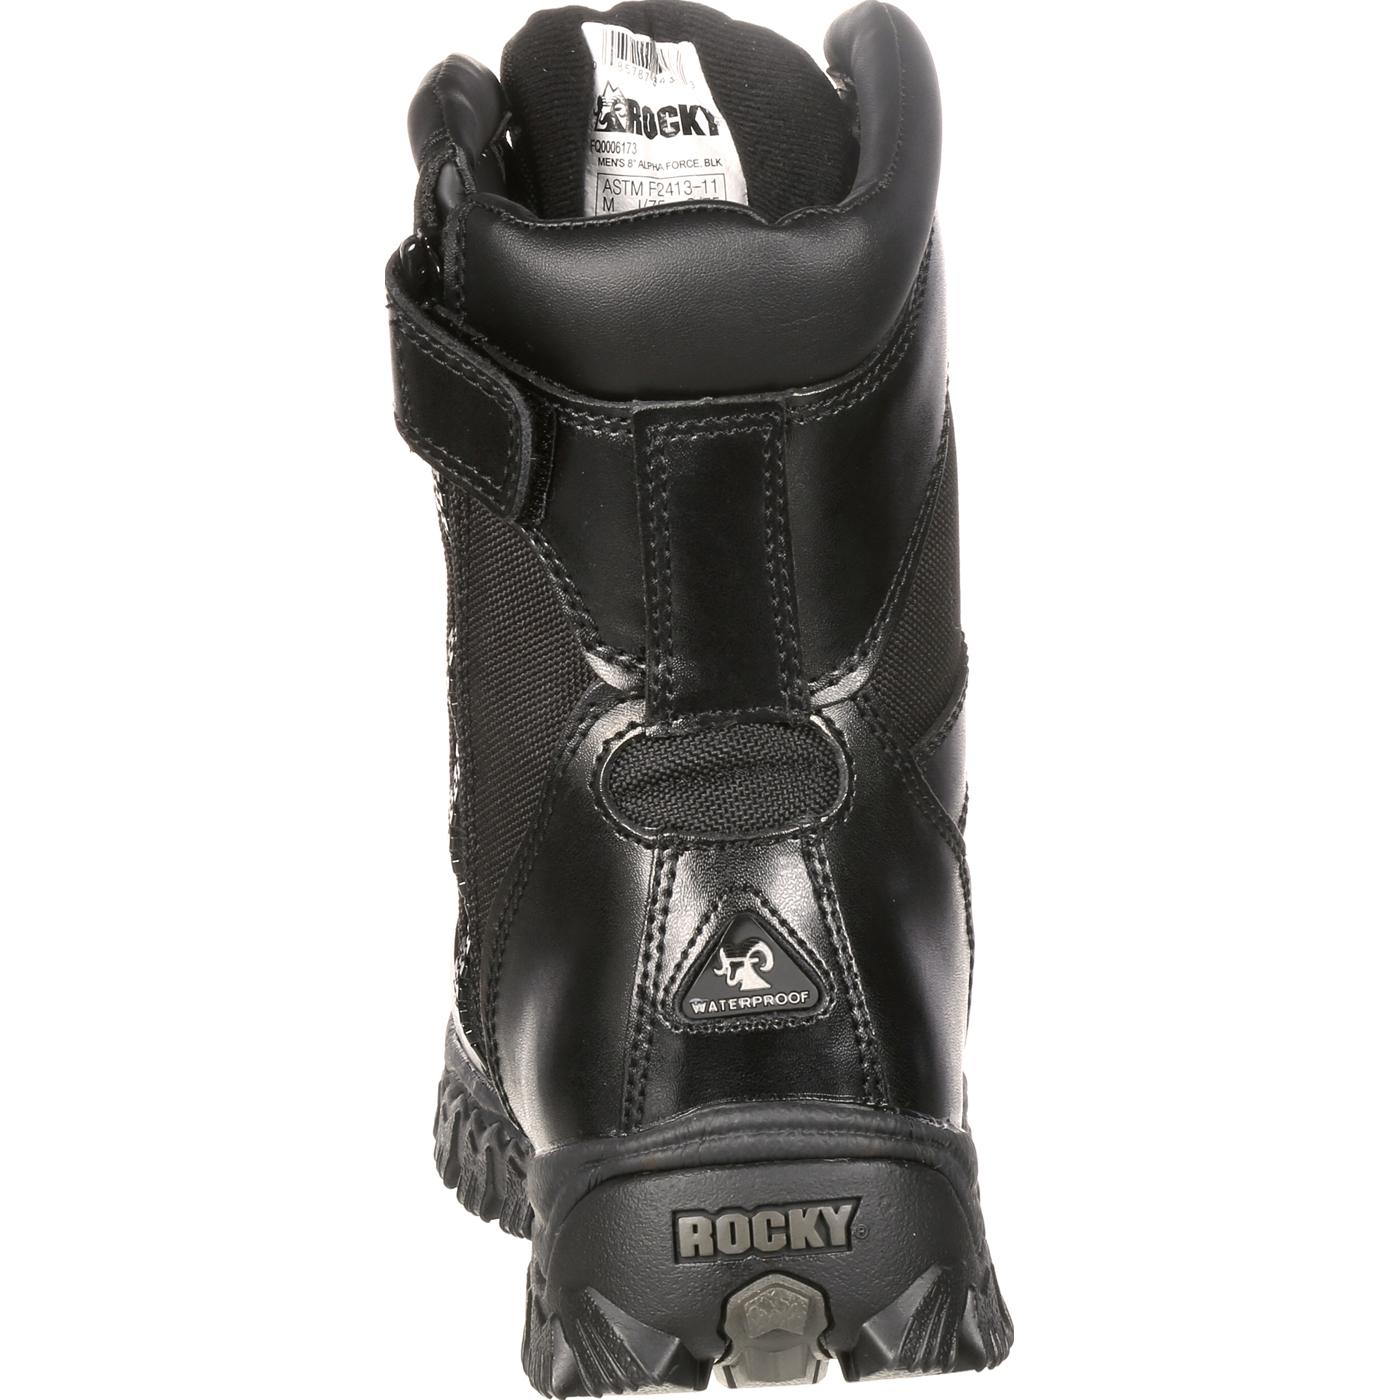 072e5a7b8a8 Rocky AlphaForce Zipper Composite Toe Public Service Boot